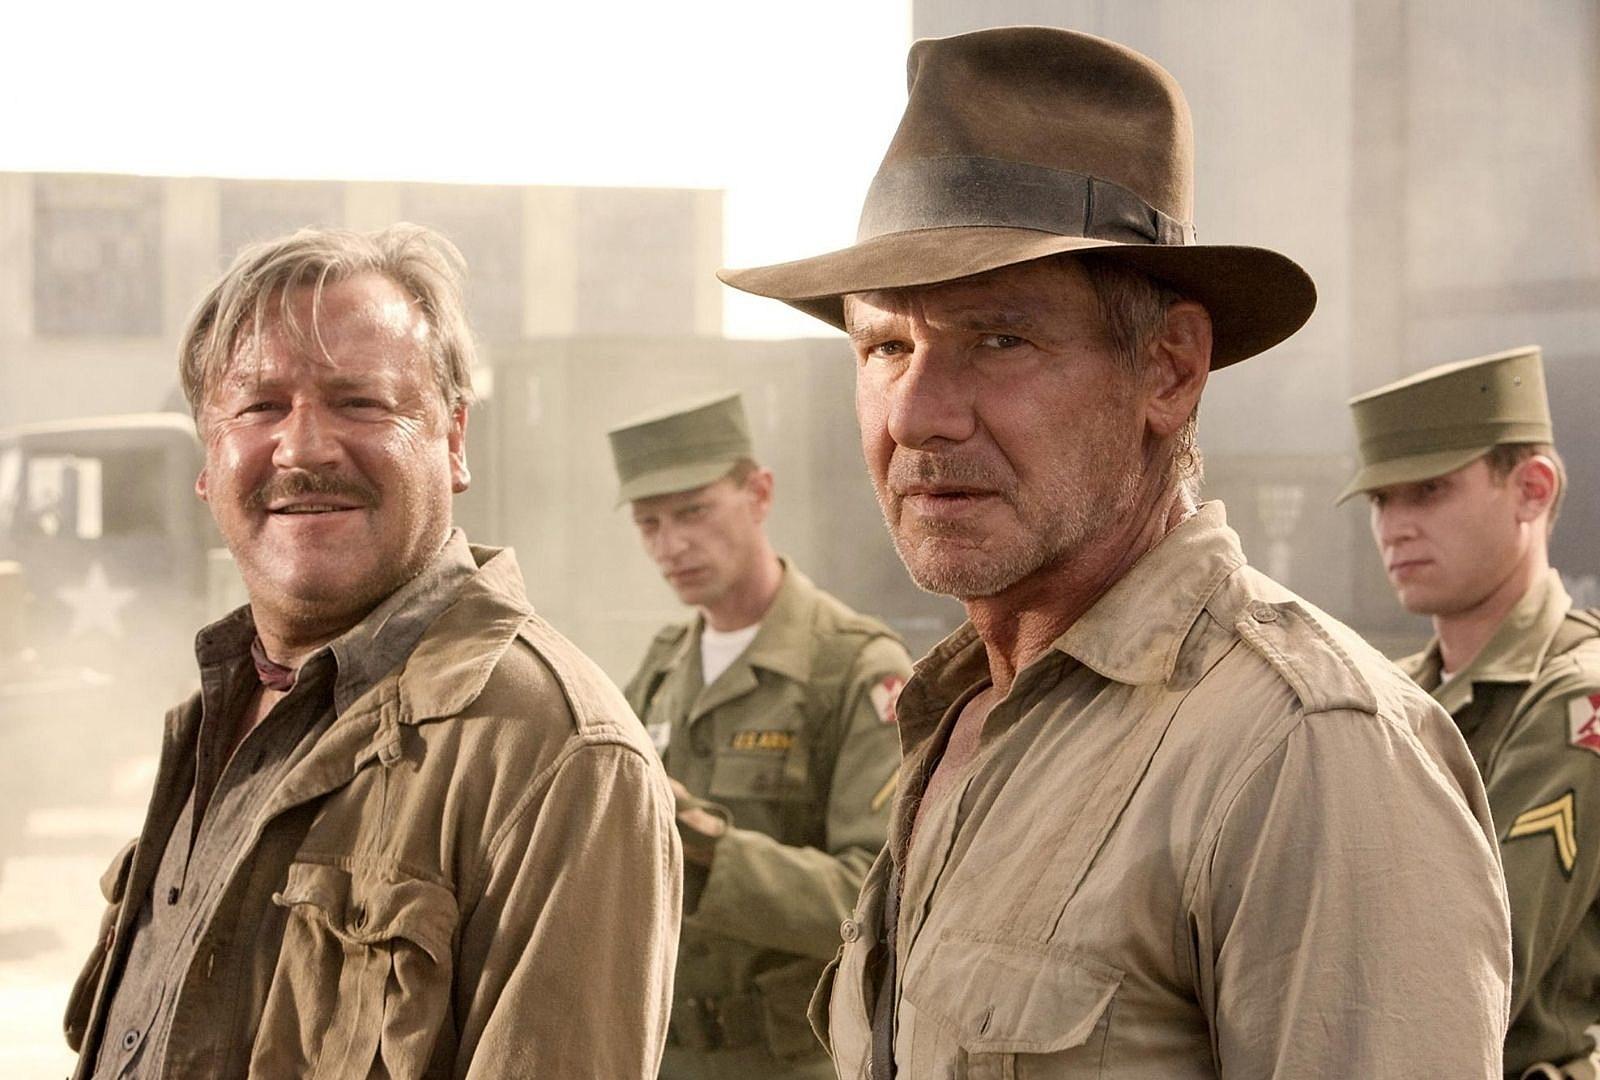 New 'Indiana Jones 5' Set Photo May Confirm Plot Rumor